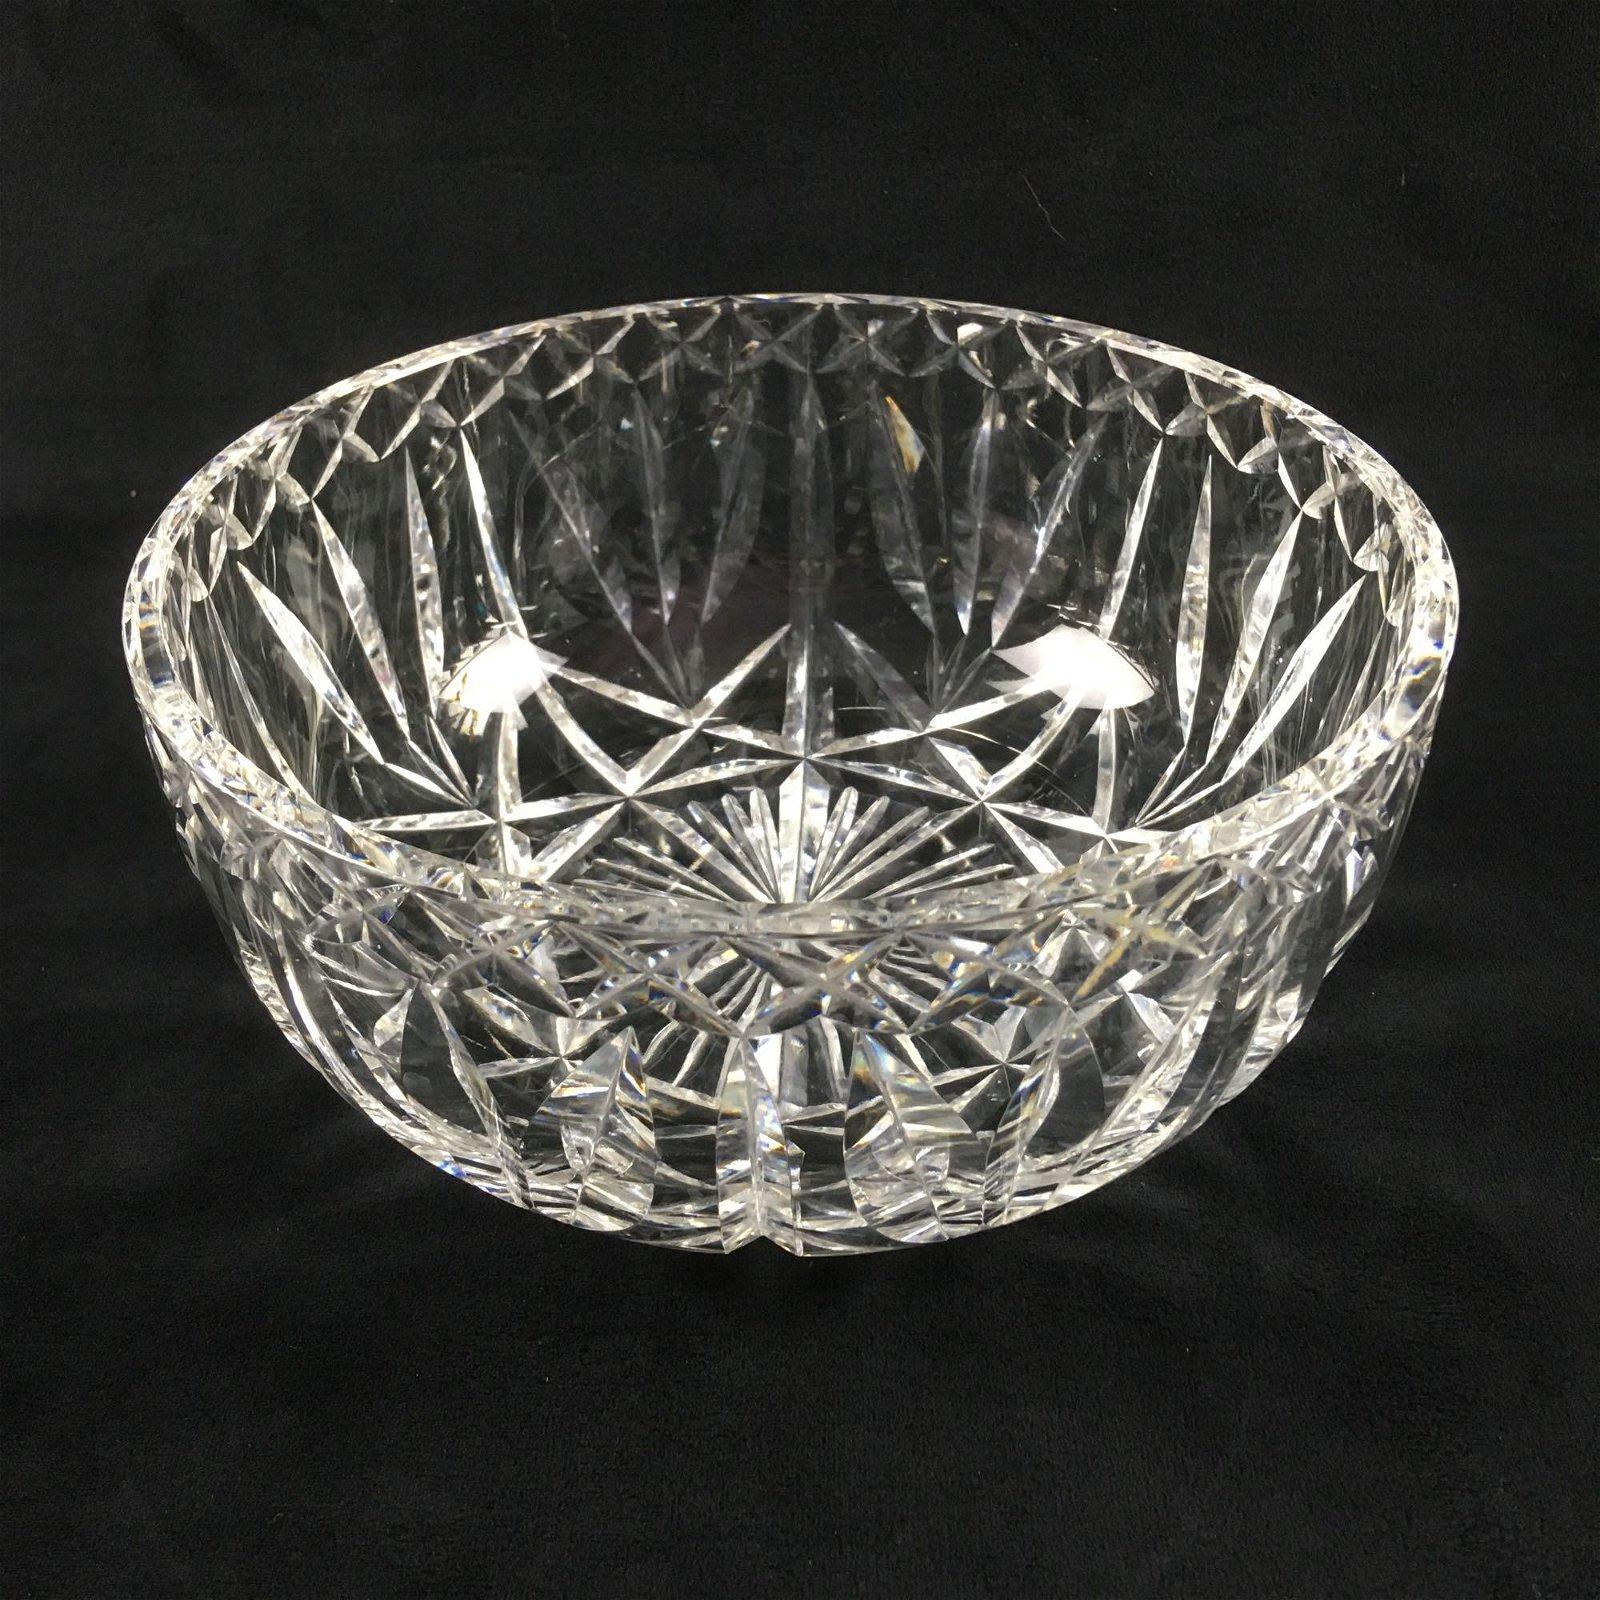 Vintage Waterford Fine Clear Cut Crystal Bowl